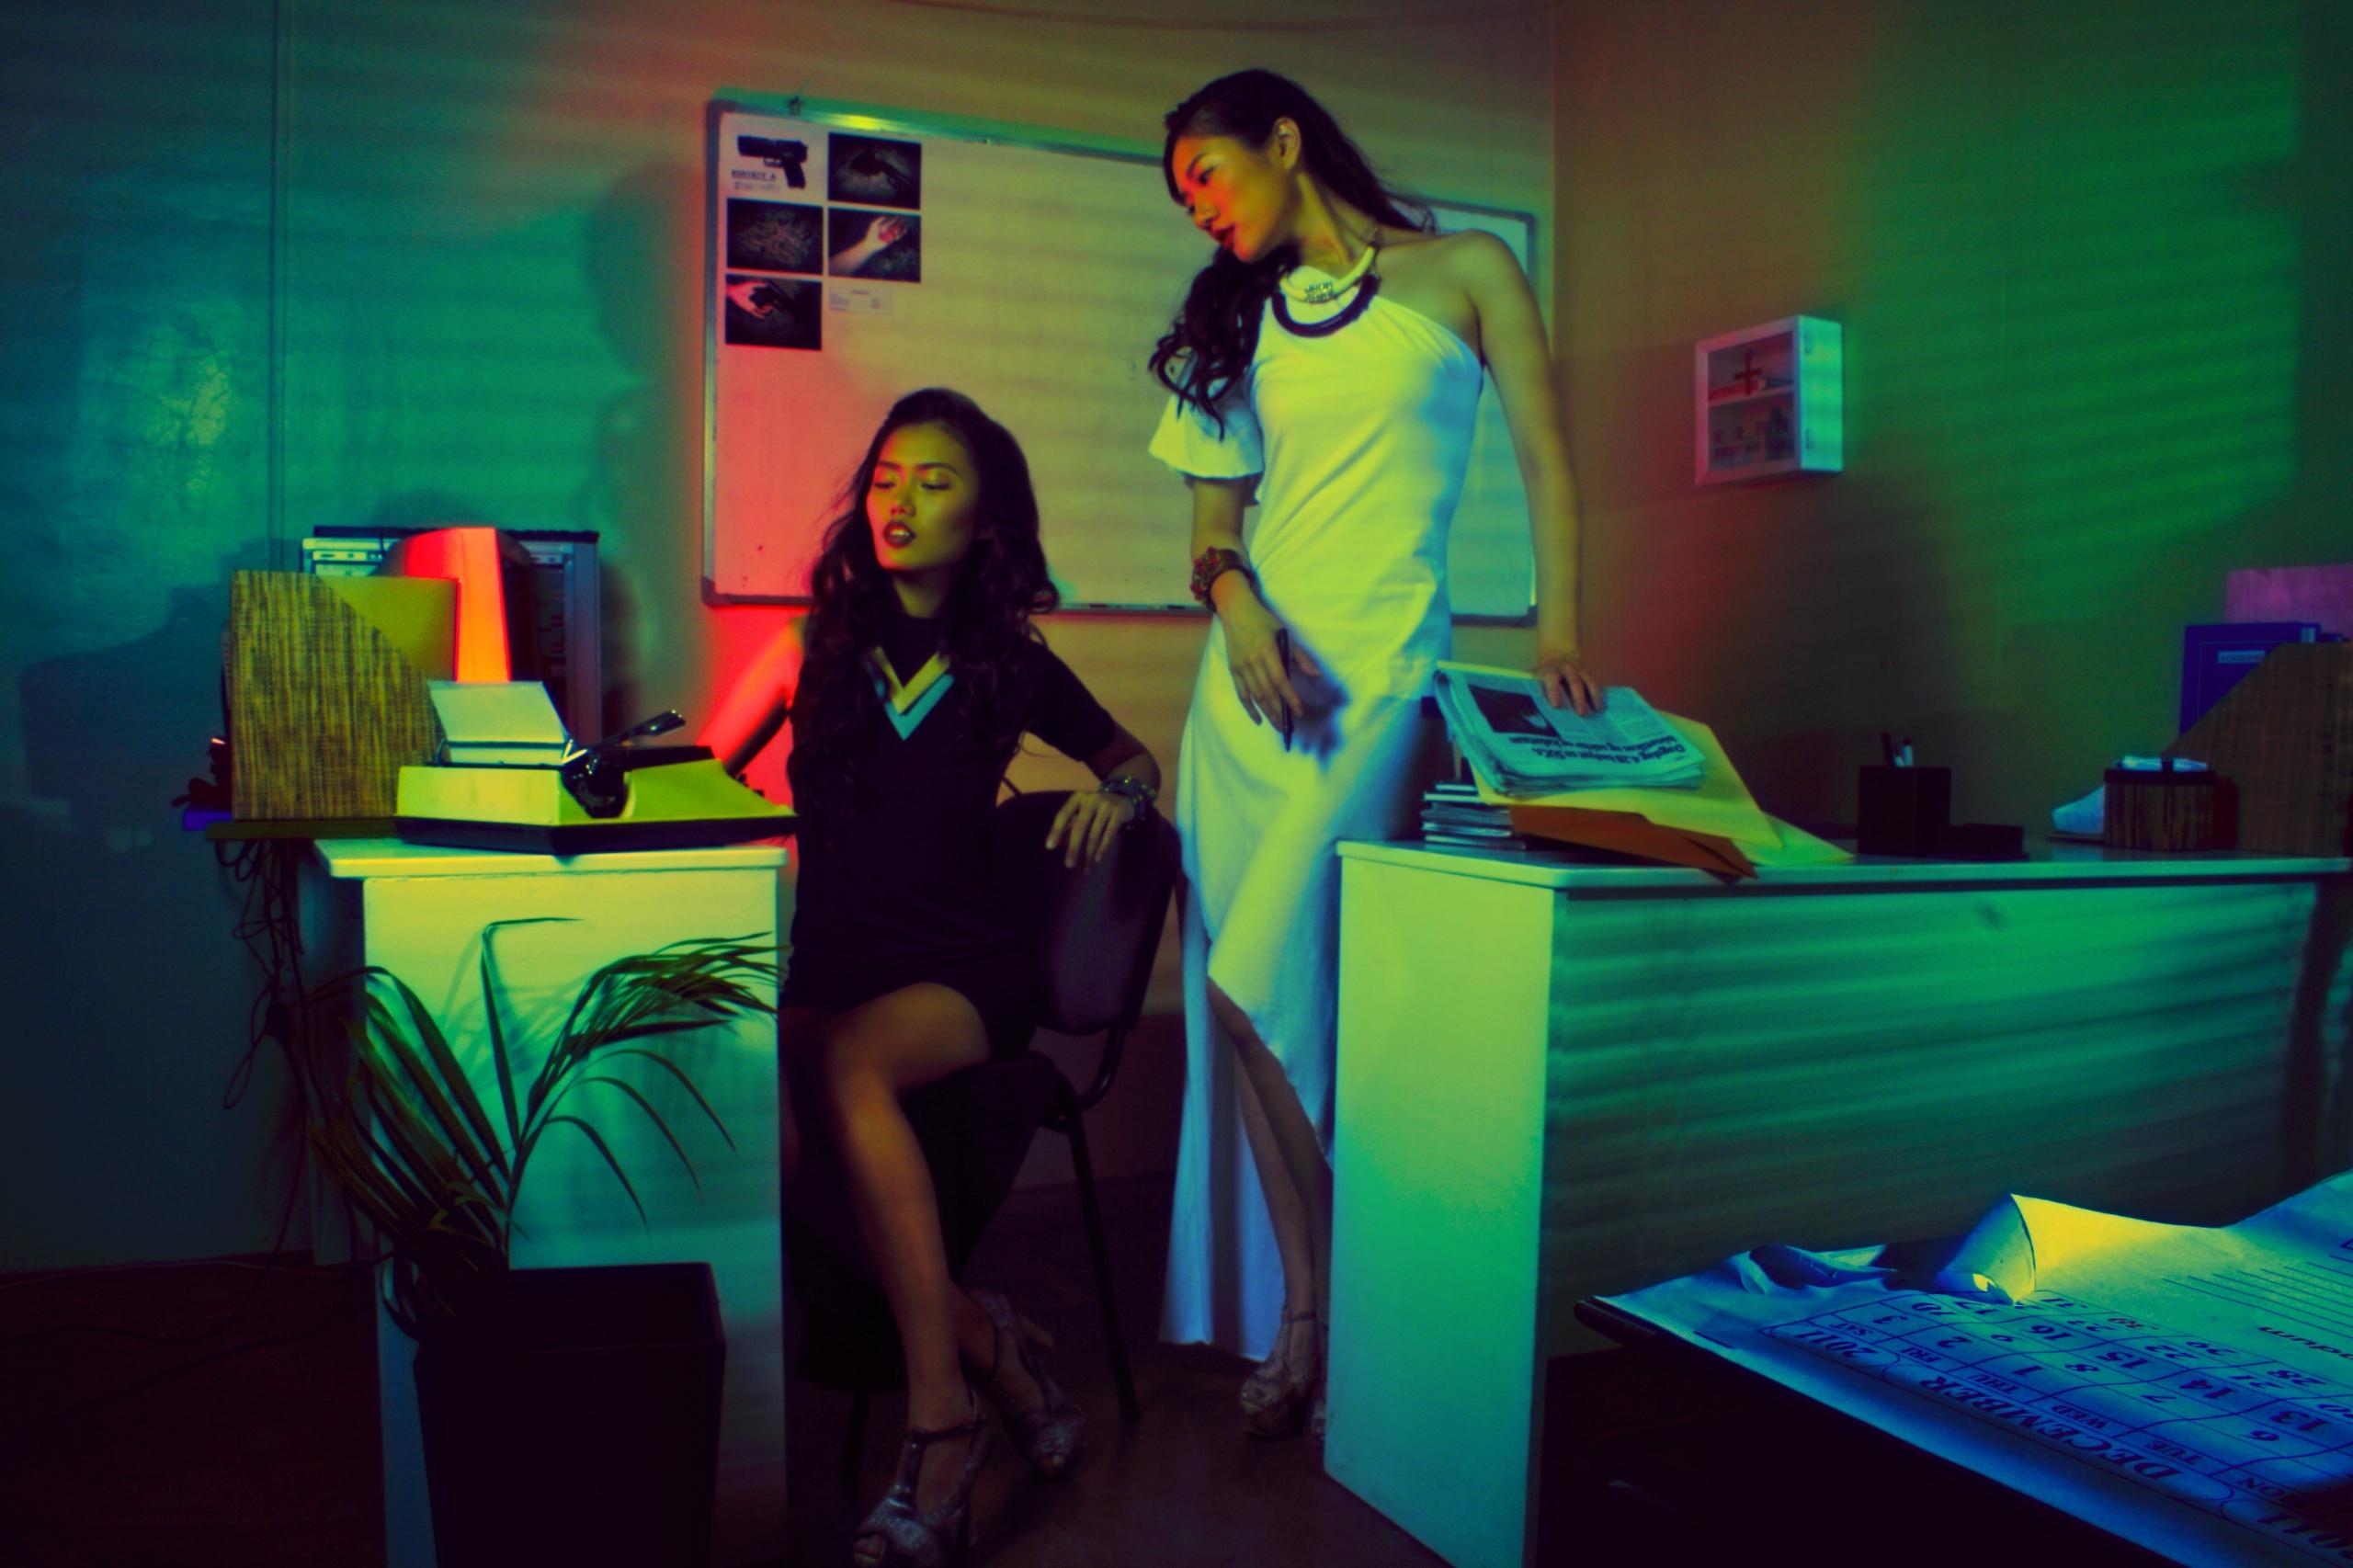 Eriko Malabanan Jessica Yang ph - adriangonzales | ello